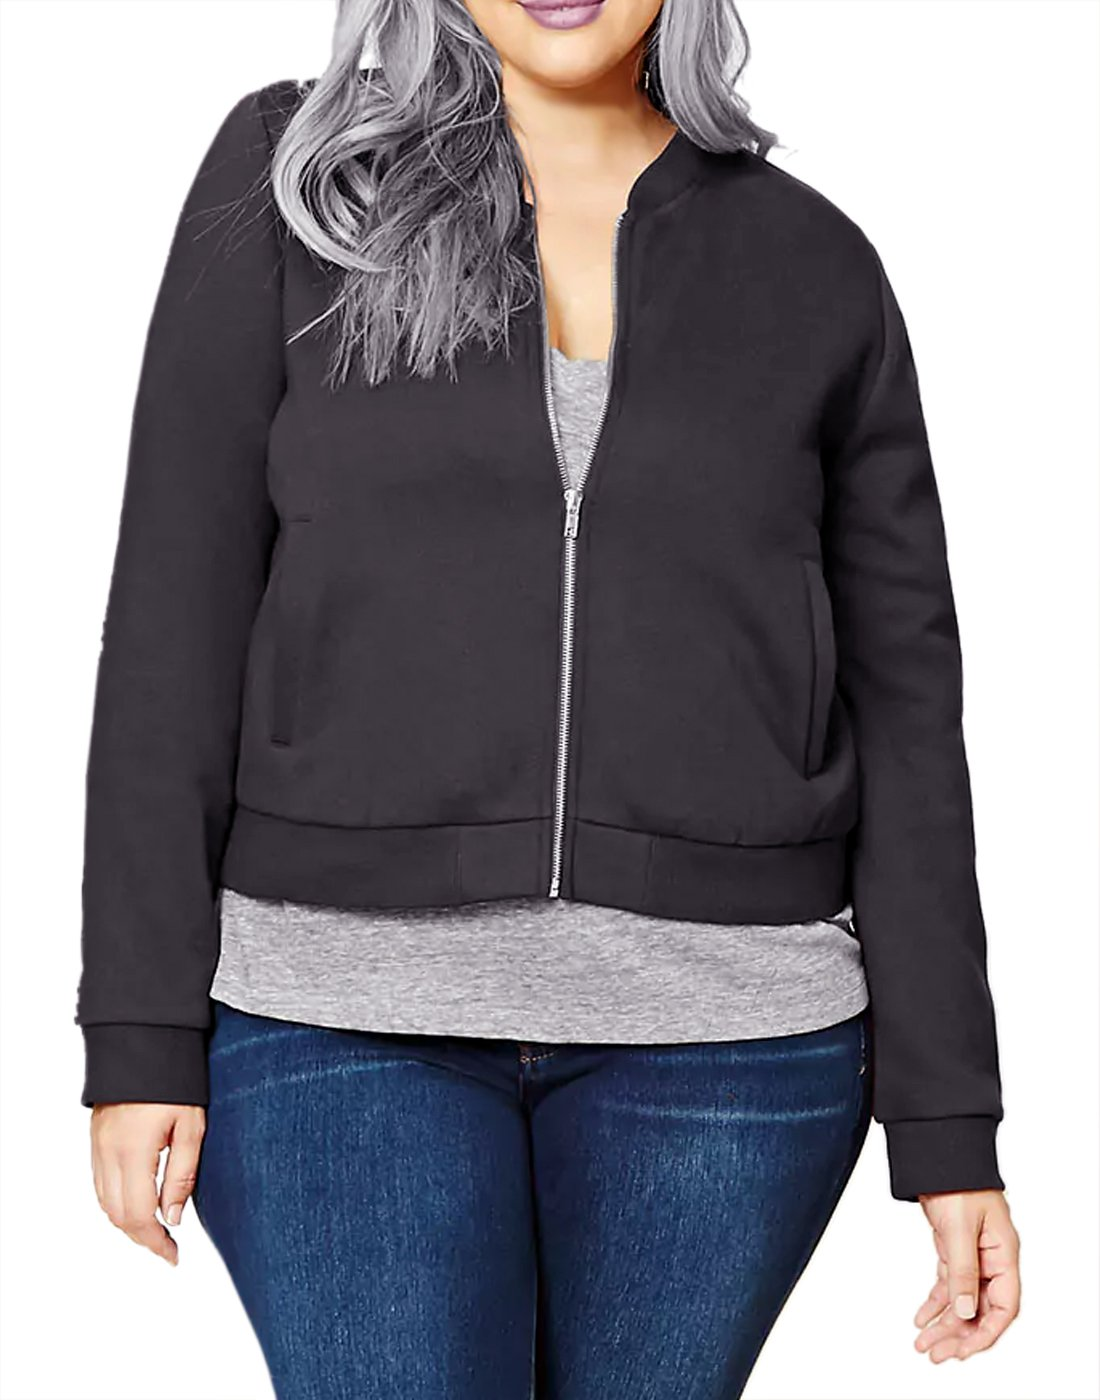 HDE Womens Plus Bomber Jacket Thin Short Coat Zipper For Women 1X-3X